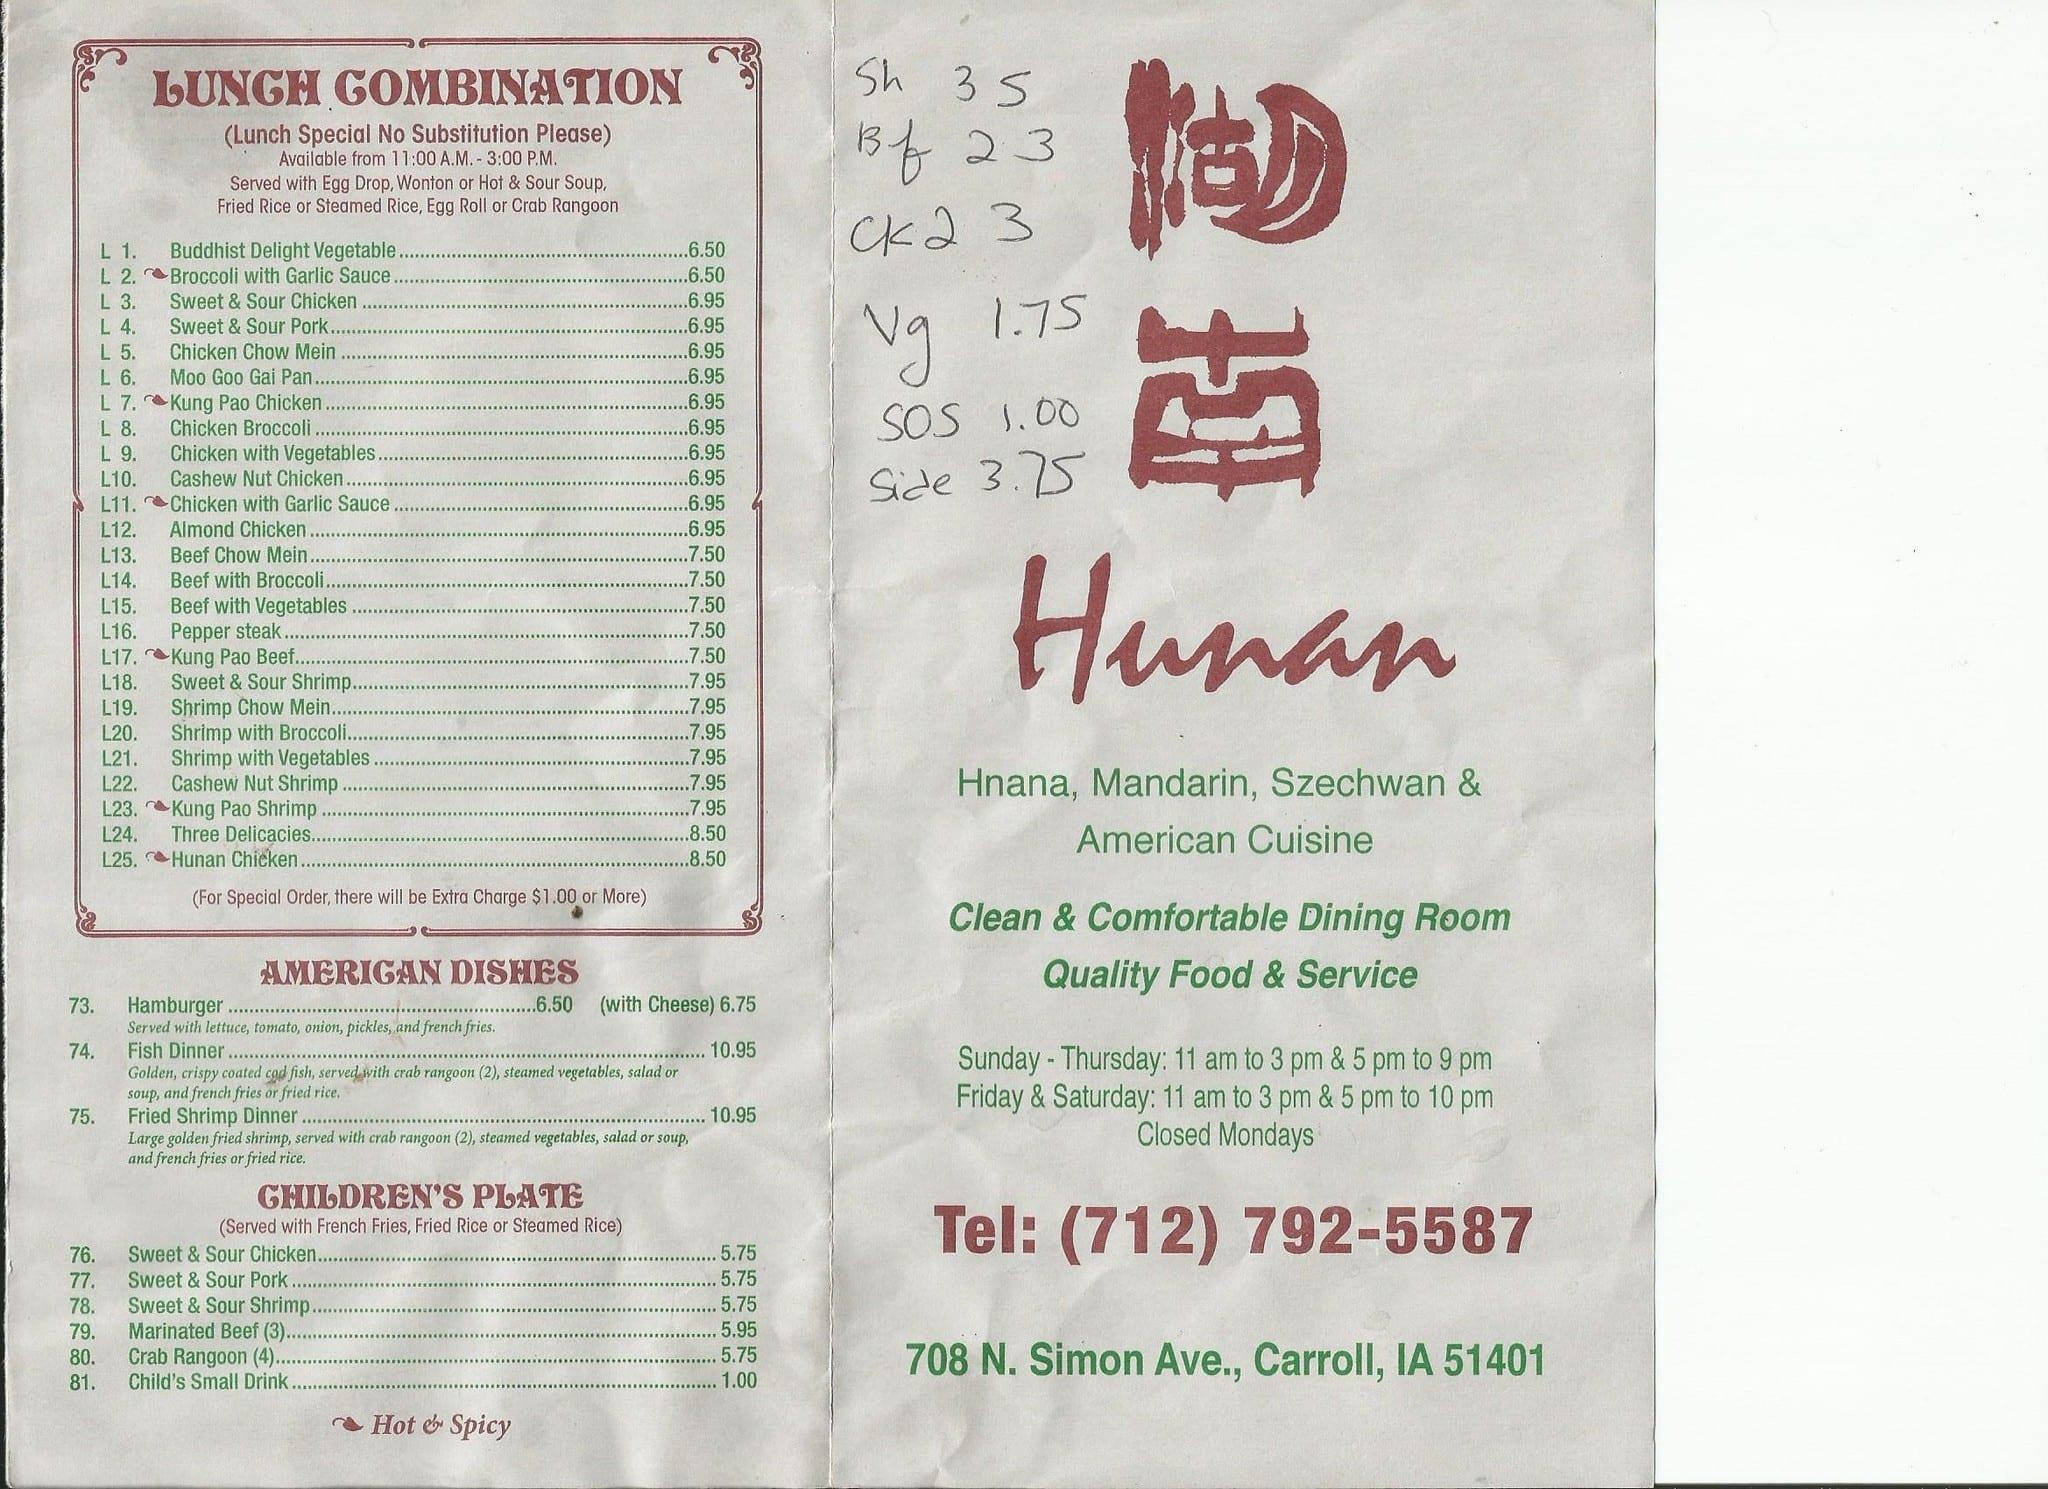 Hunan chinese restaurant menu menu for hunan chinese for Asian cuisine grimes ia menu